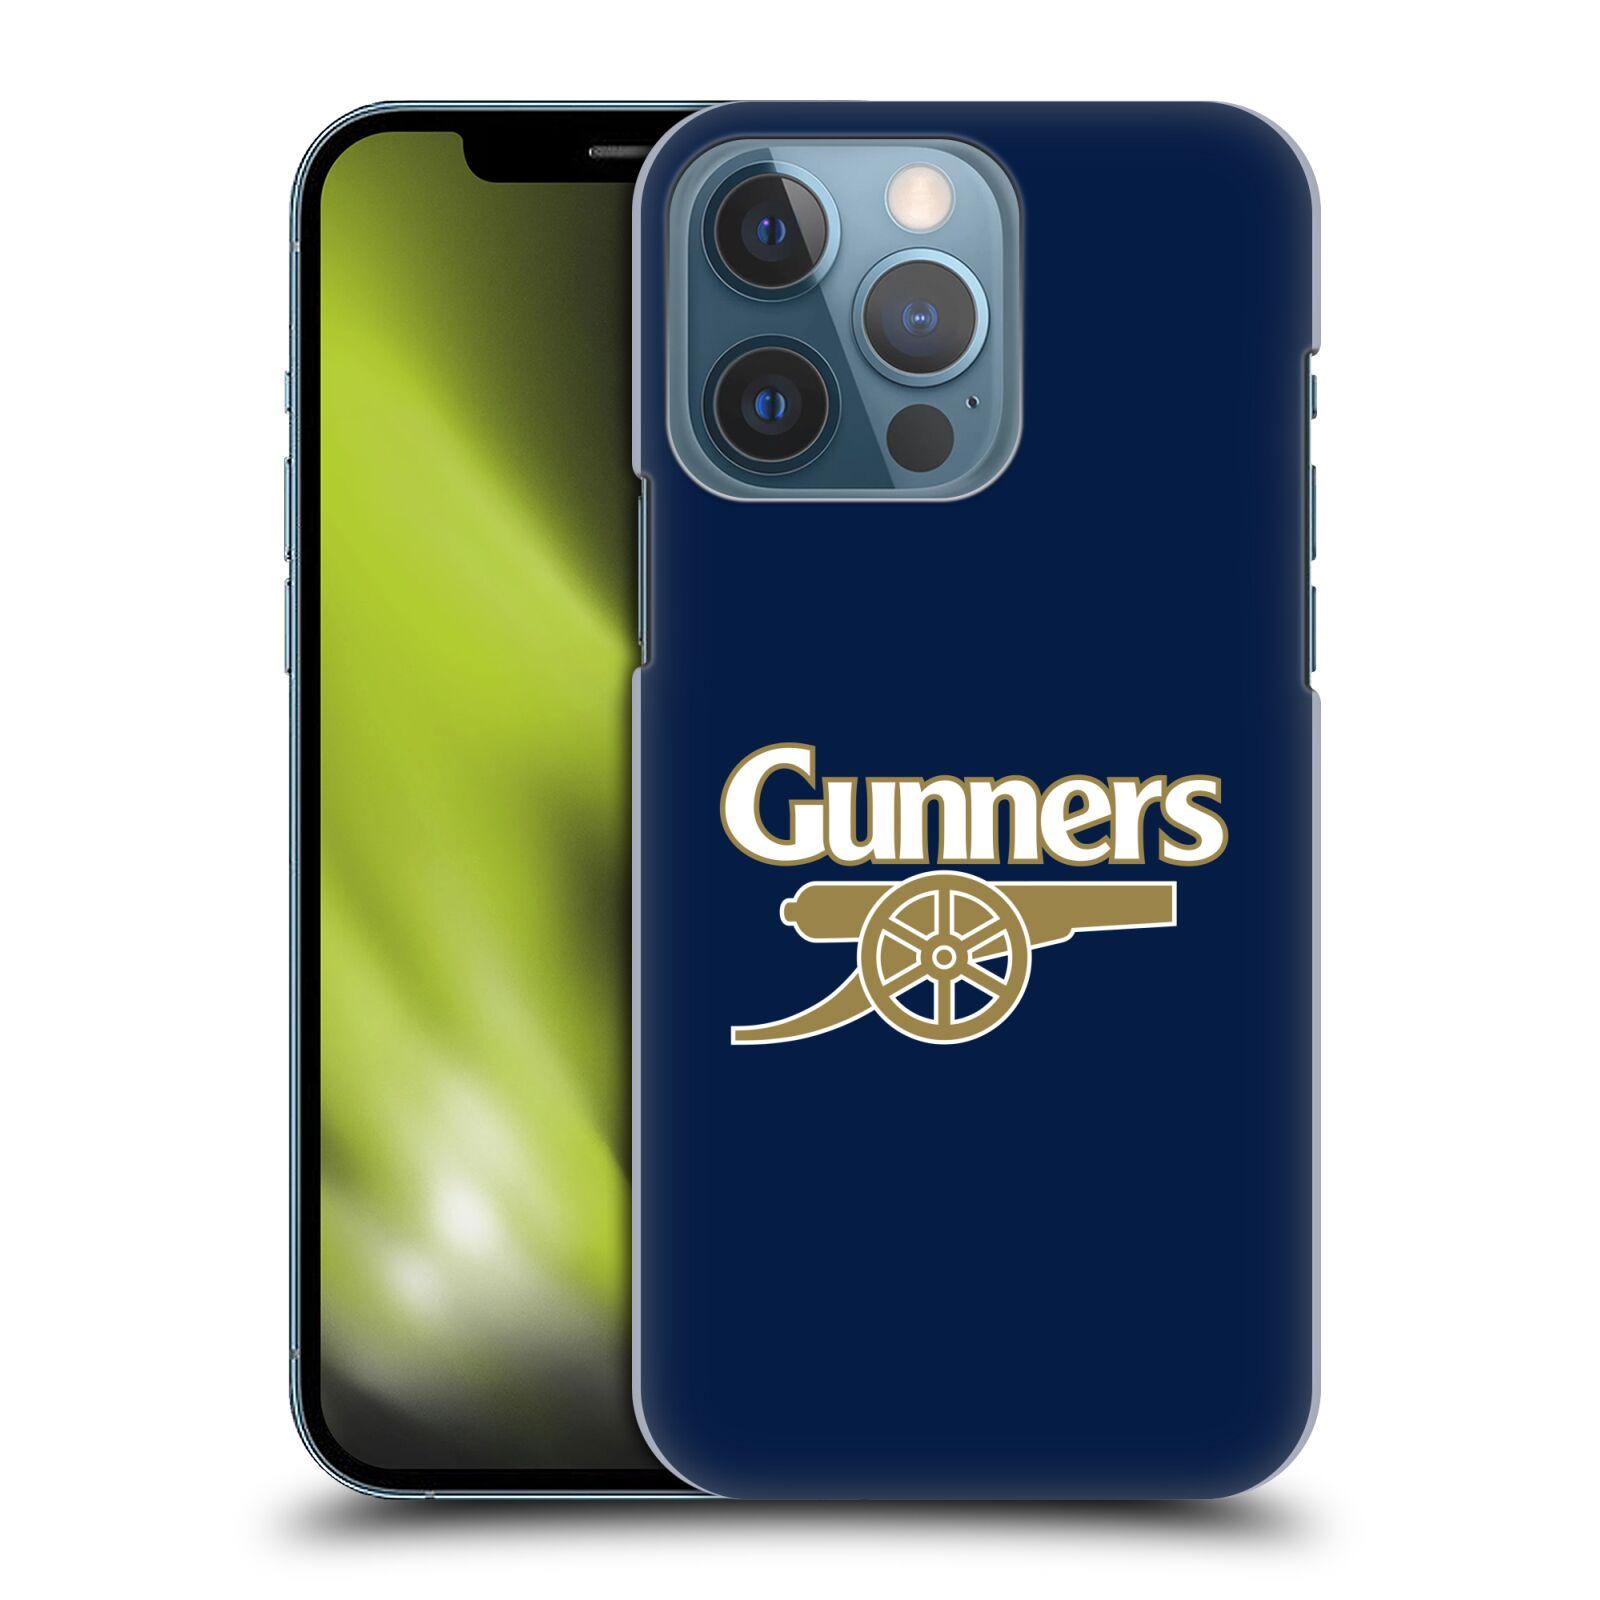 Plastové pouzdro na mobil Apple iPhone 13 Pro - Head Case - Arsenal FC - Gunners